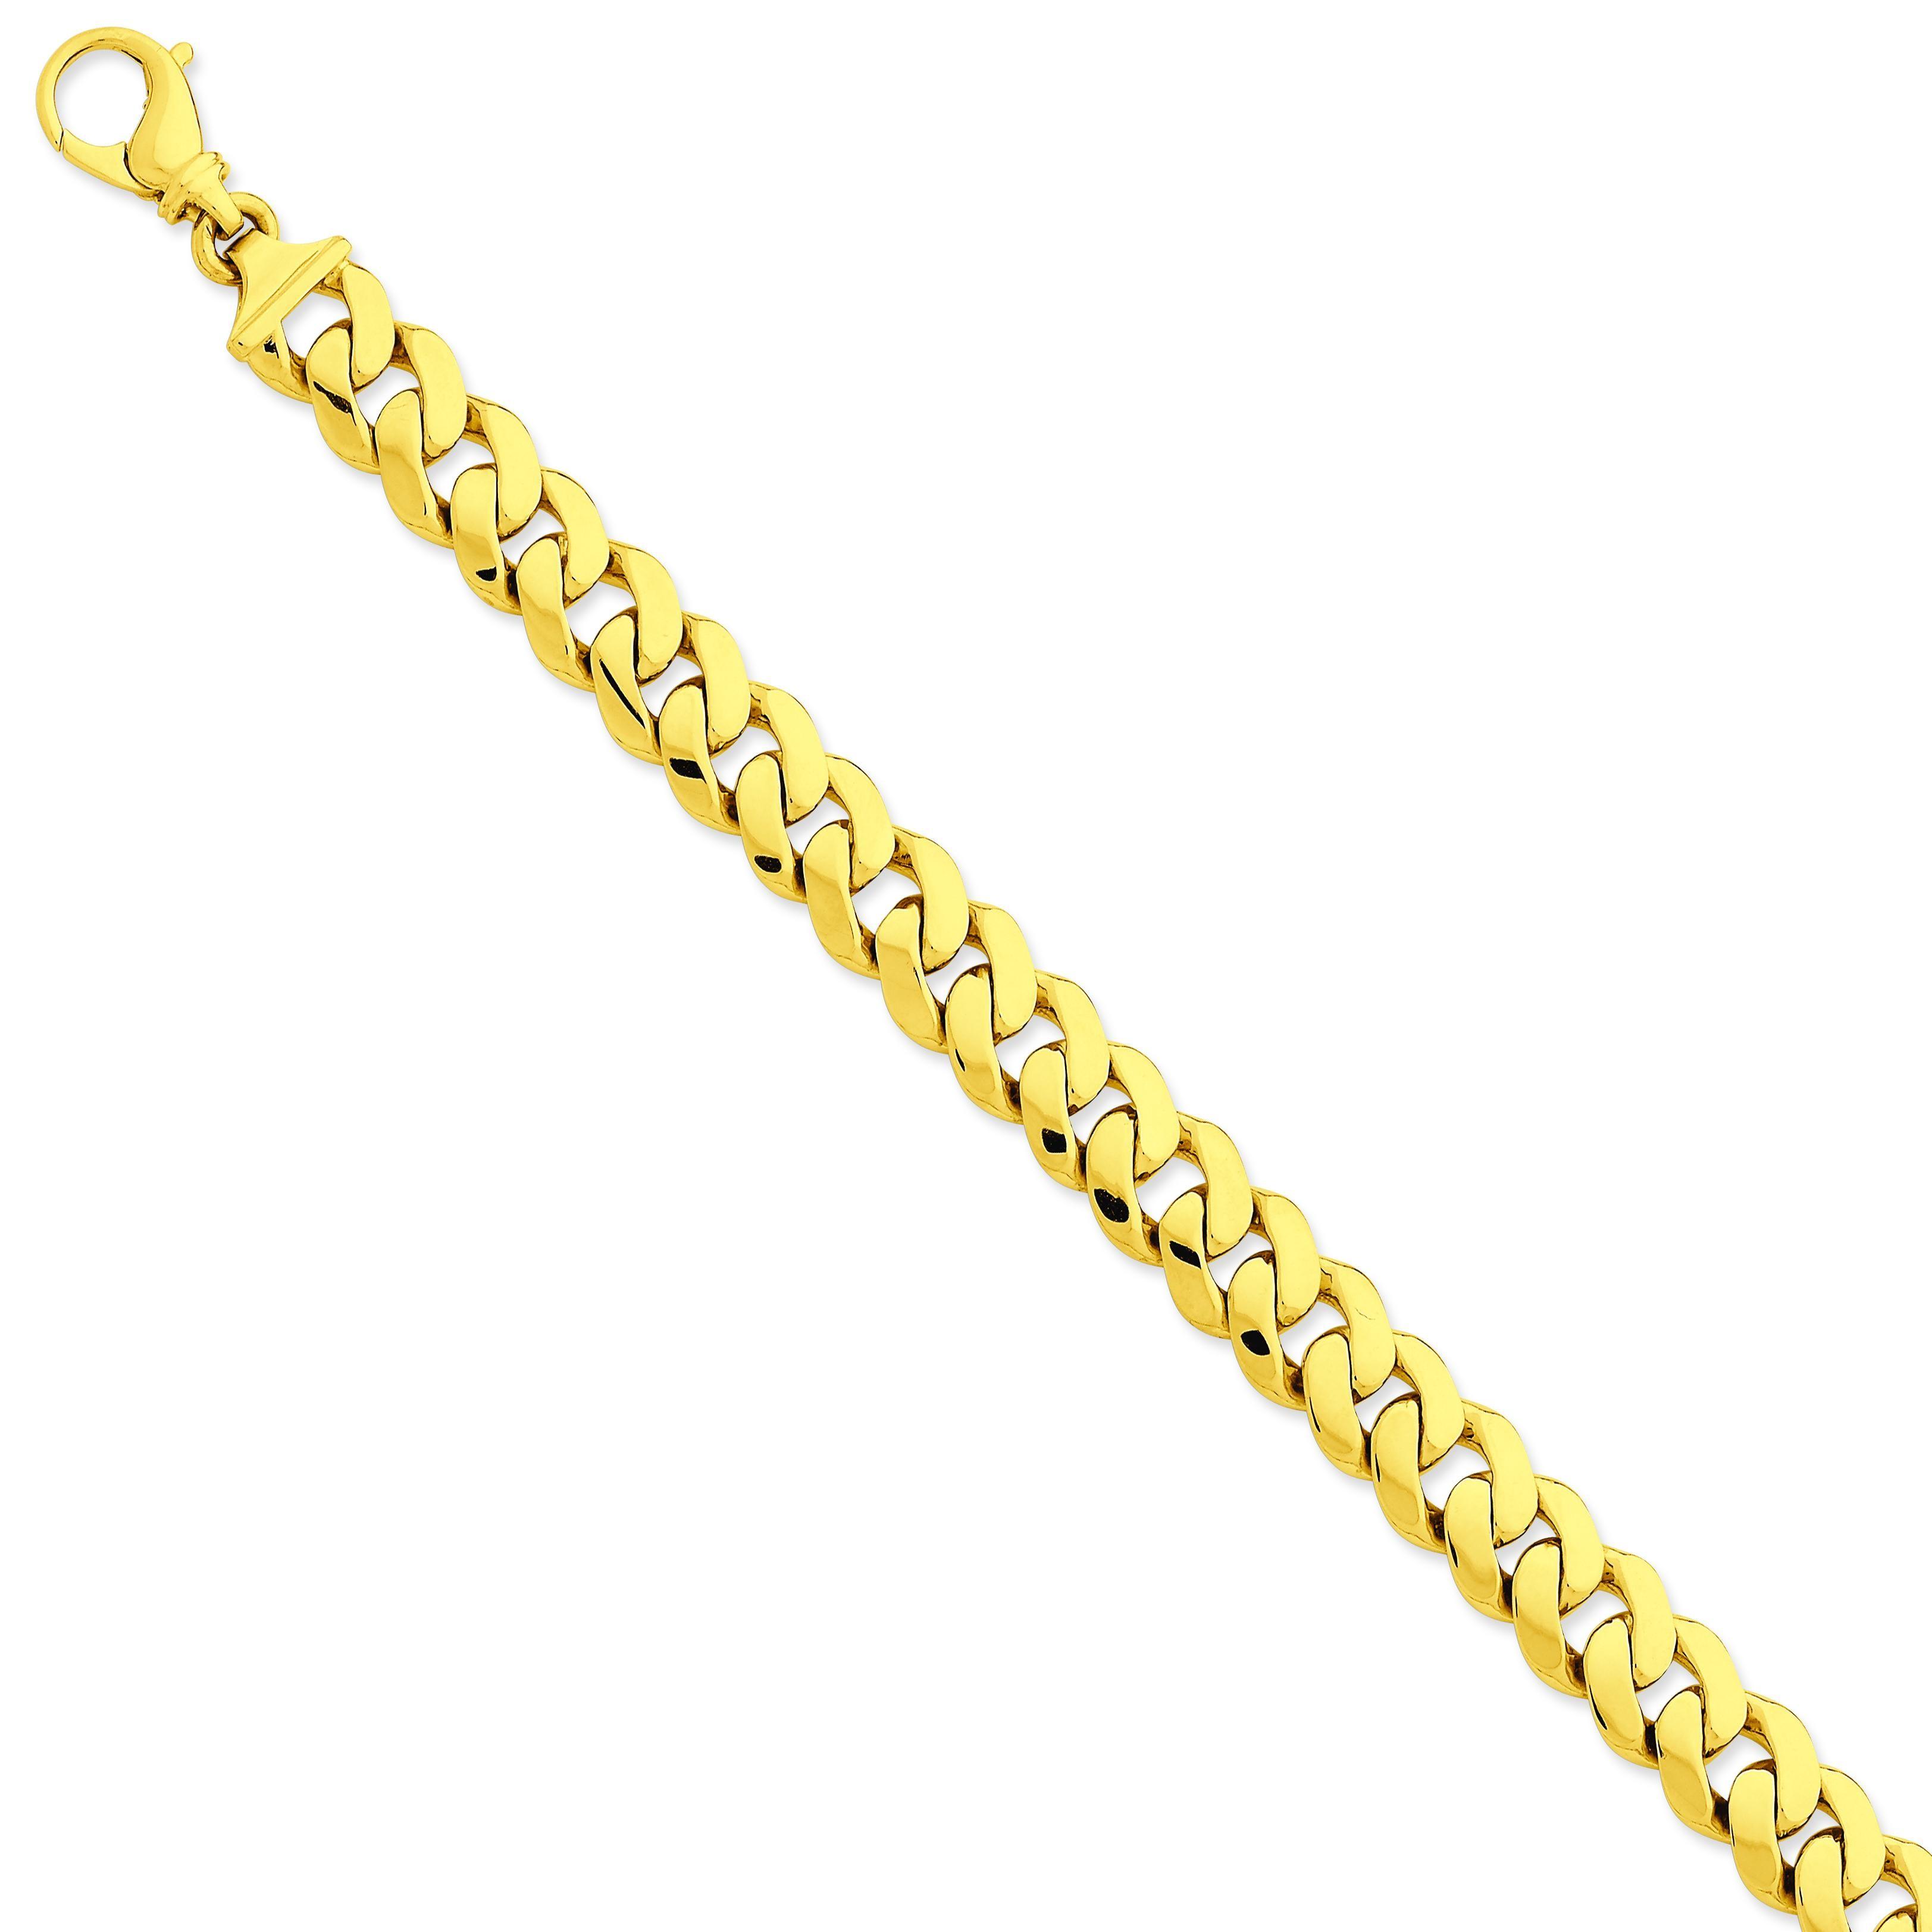 10.75mm Link Bracelet in 14k Yellow Gold